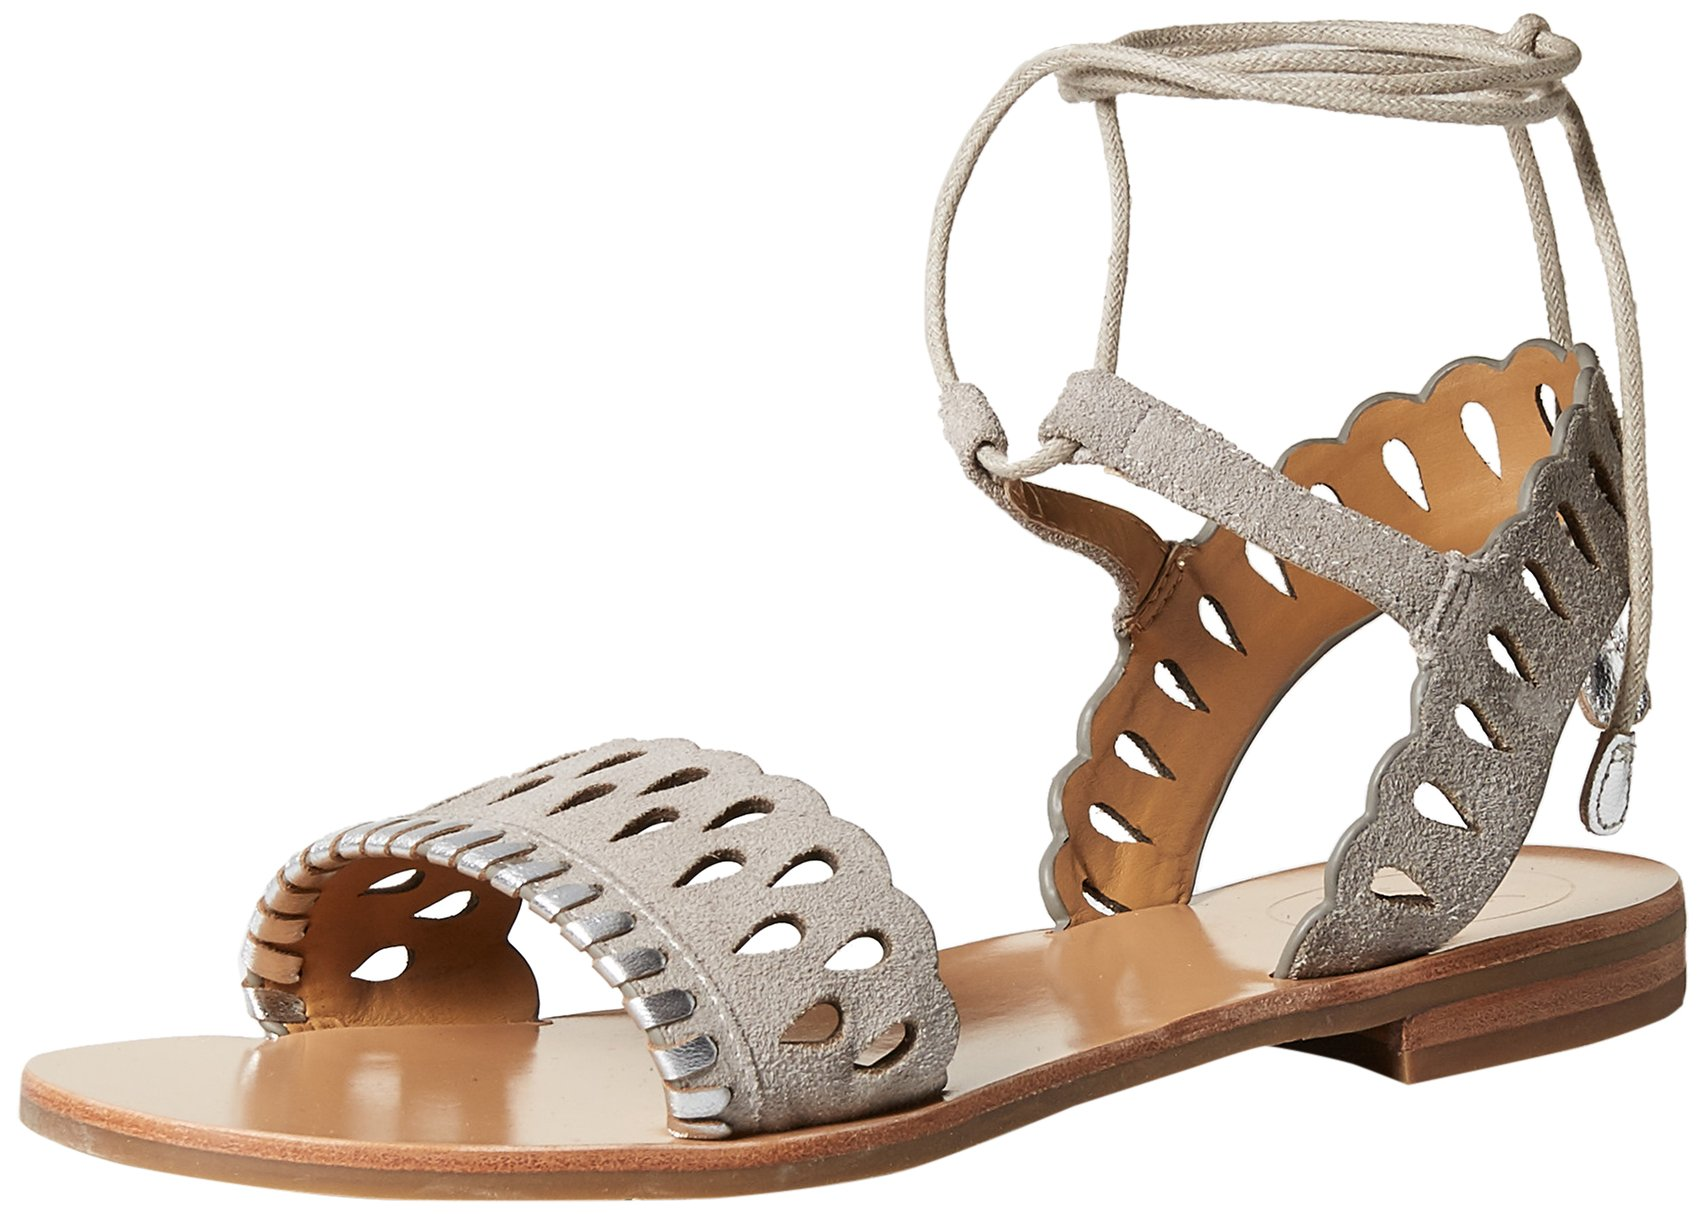 Jack Rogers Women's Ruby Suede Flat Sandal, Dove Grey/Silver, 6.5 Medium US